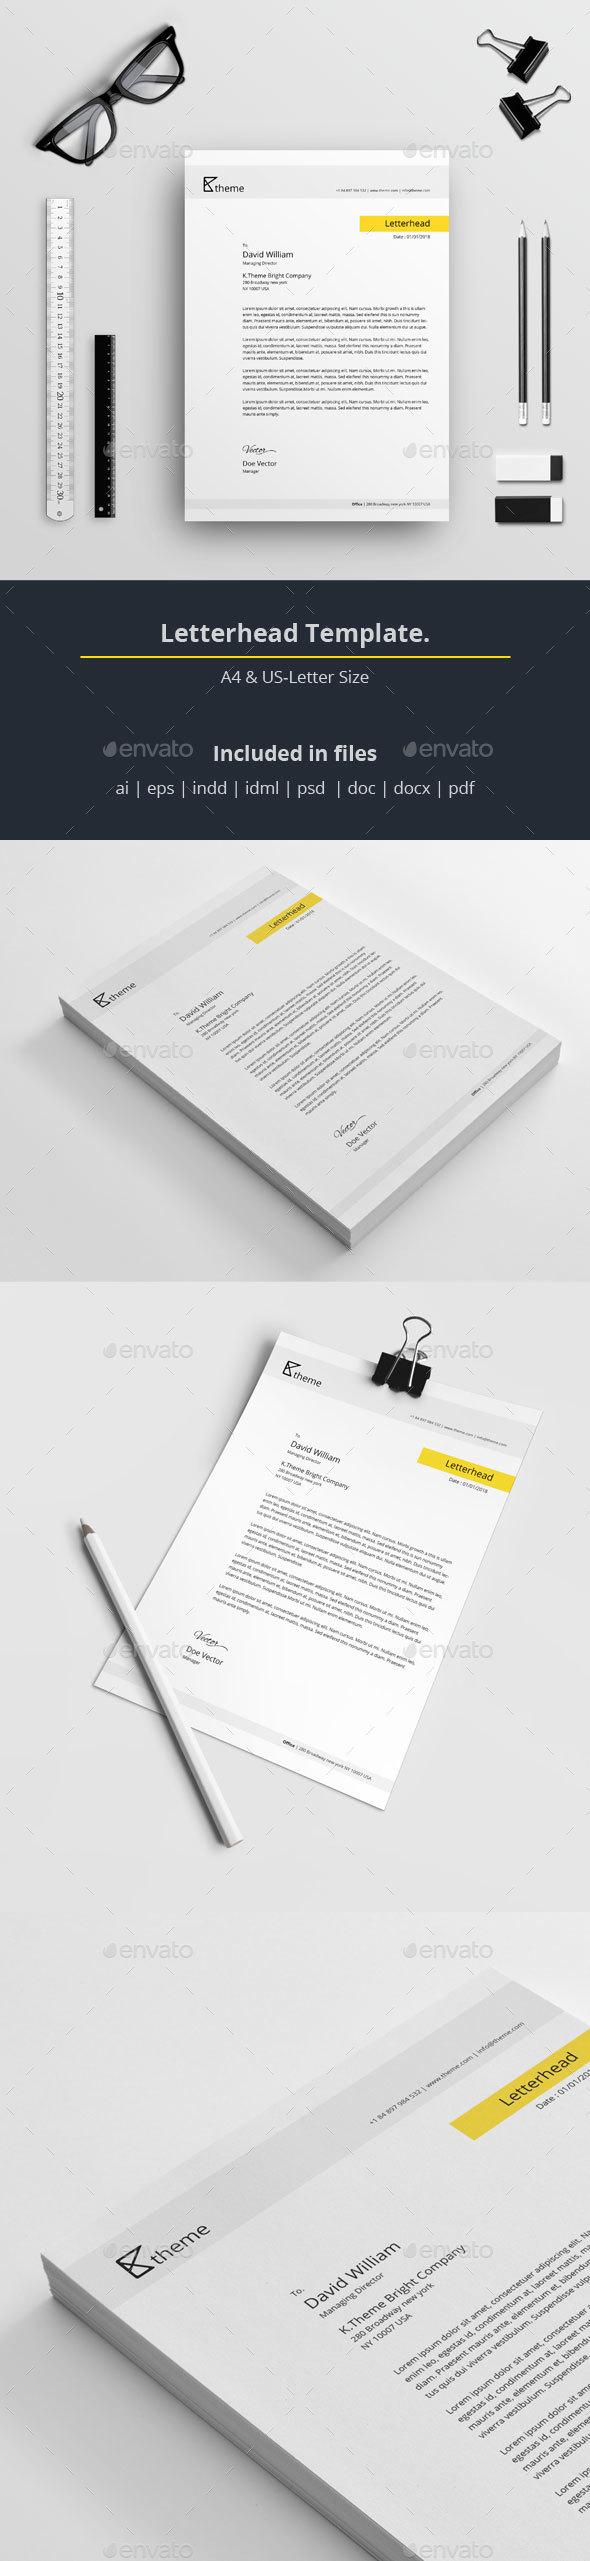 6e37f89f696 Letterhead Template A Sharp and Professional Letterhead template for  creative businesses